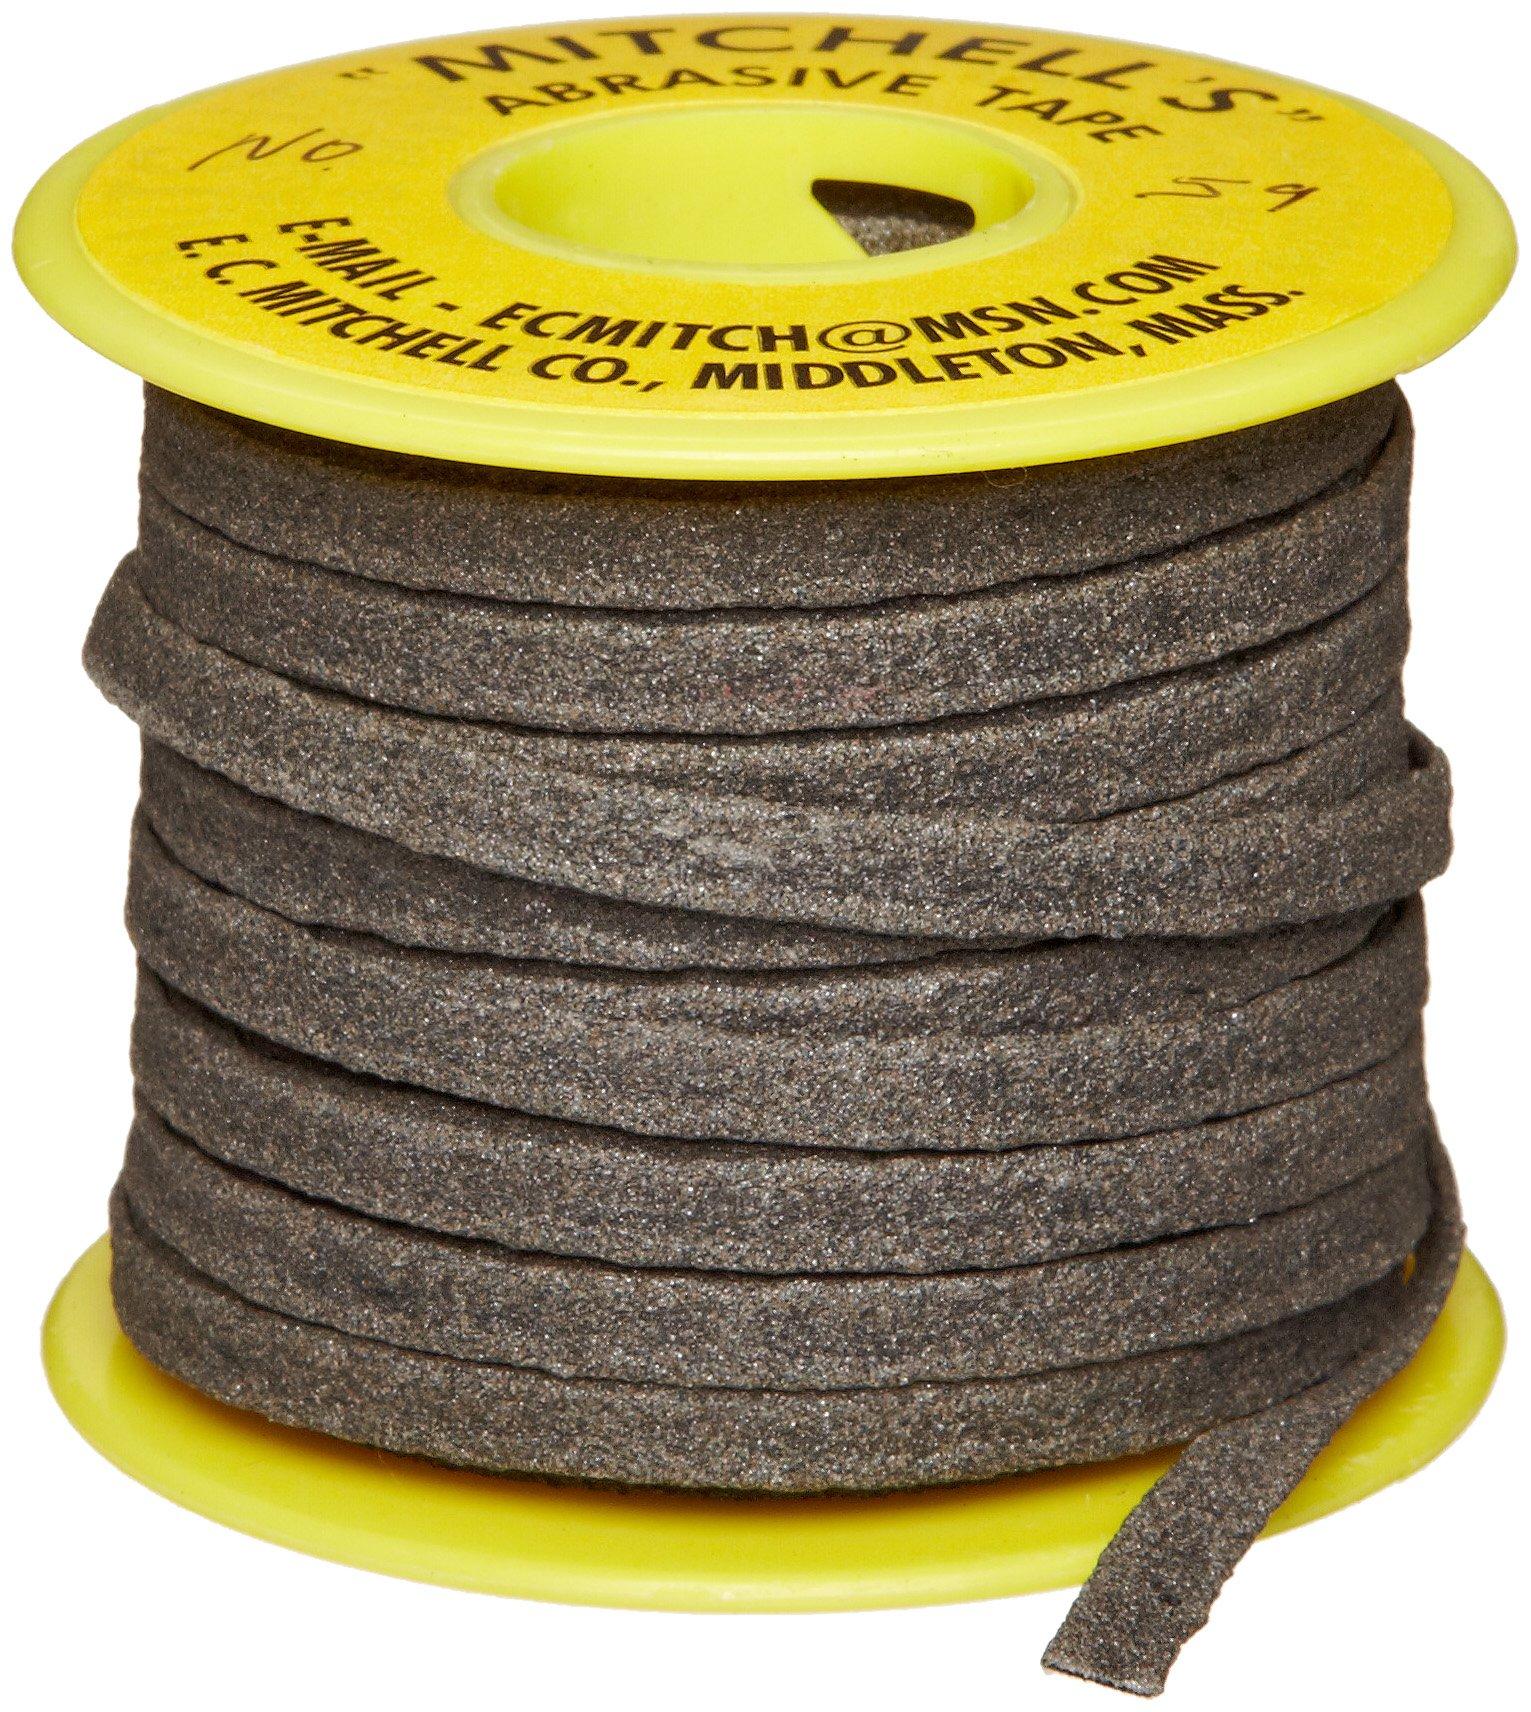 Mitchell Abrasives 59 Flat Abrasive Tape, Aluminum Oxide 150 Grit 1/4'' Wide x 25 Feet